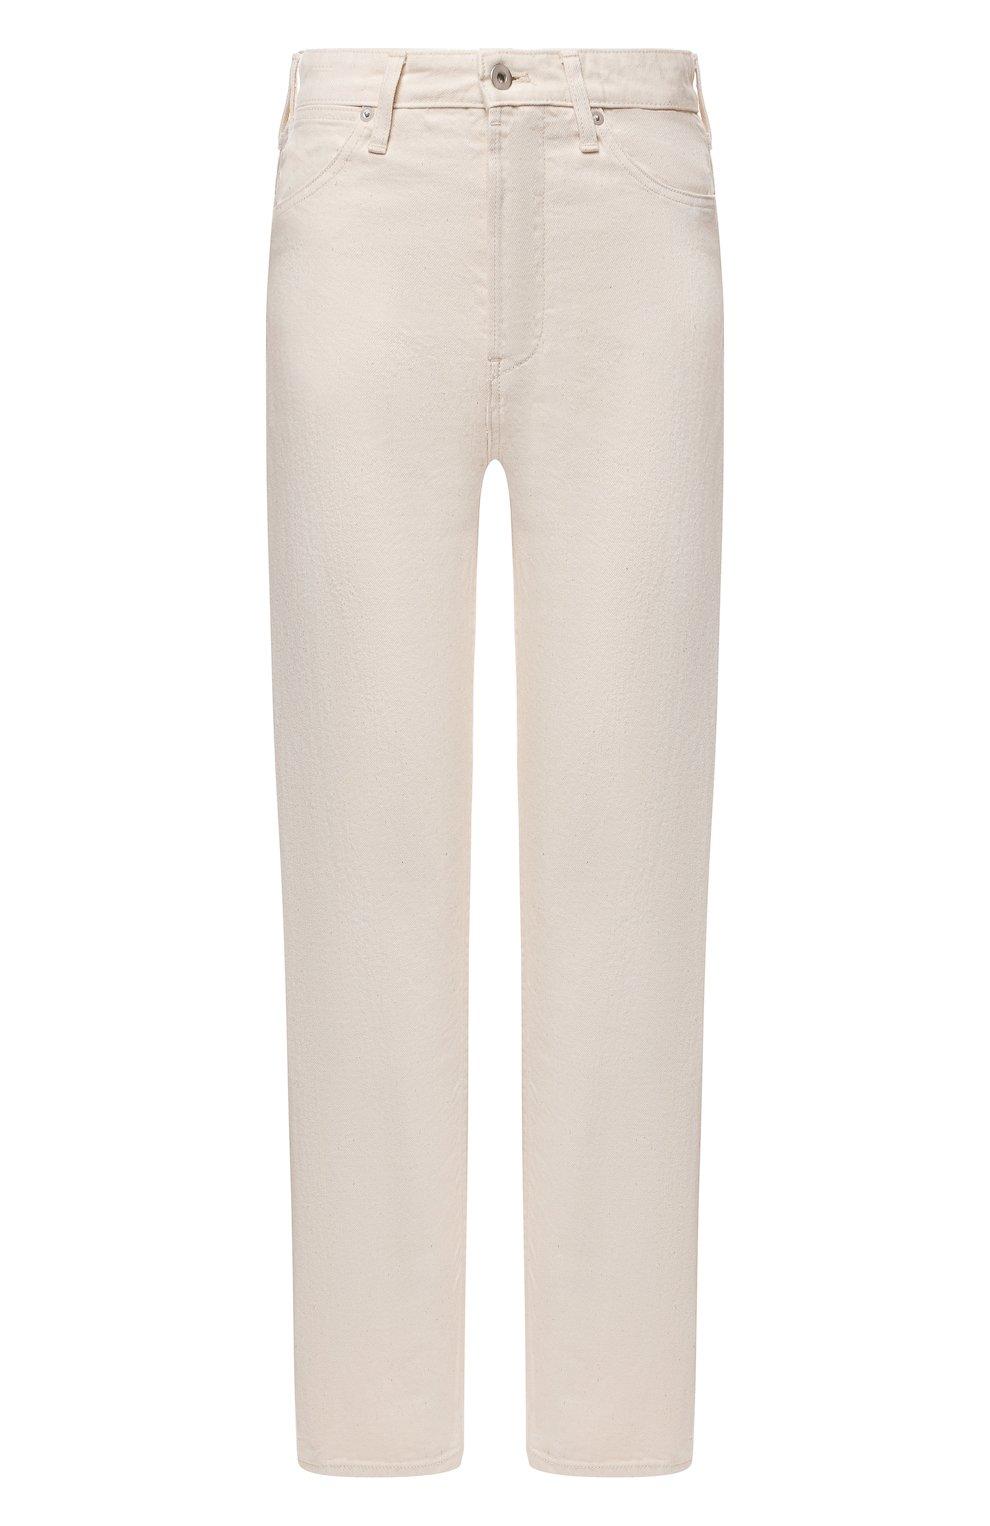 Женские джинсы JIL SANDER бежевого цвета, арт. JPPS663102-WS246500 | Фото 1